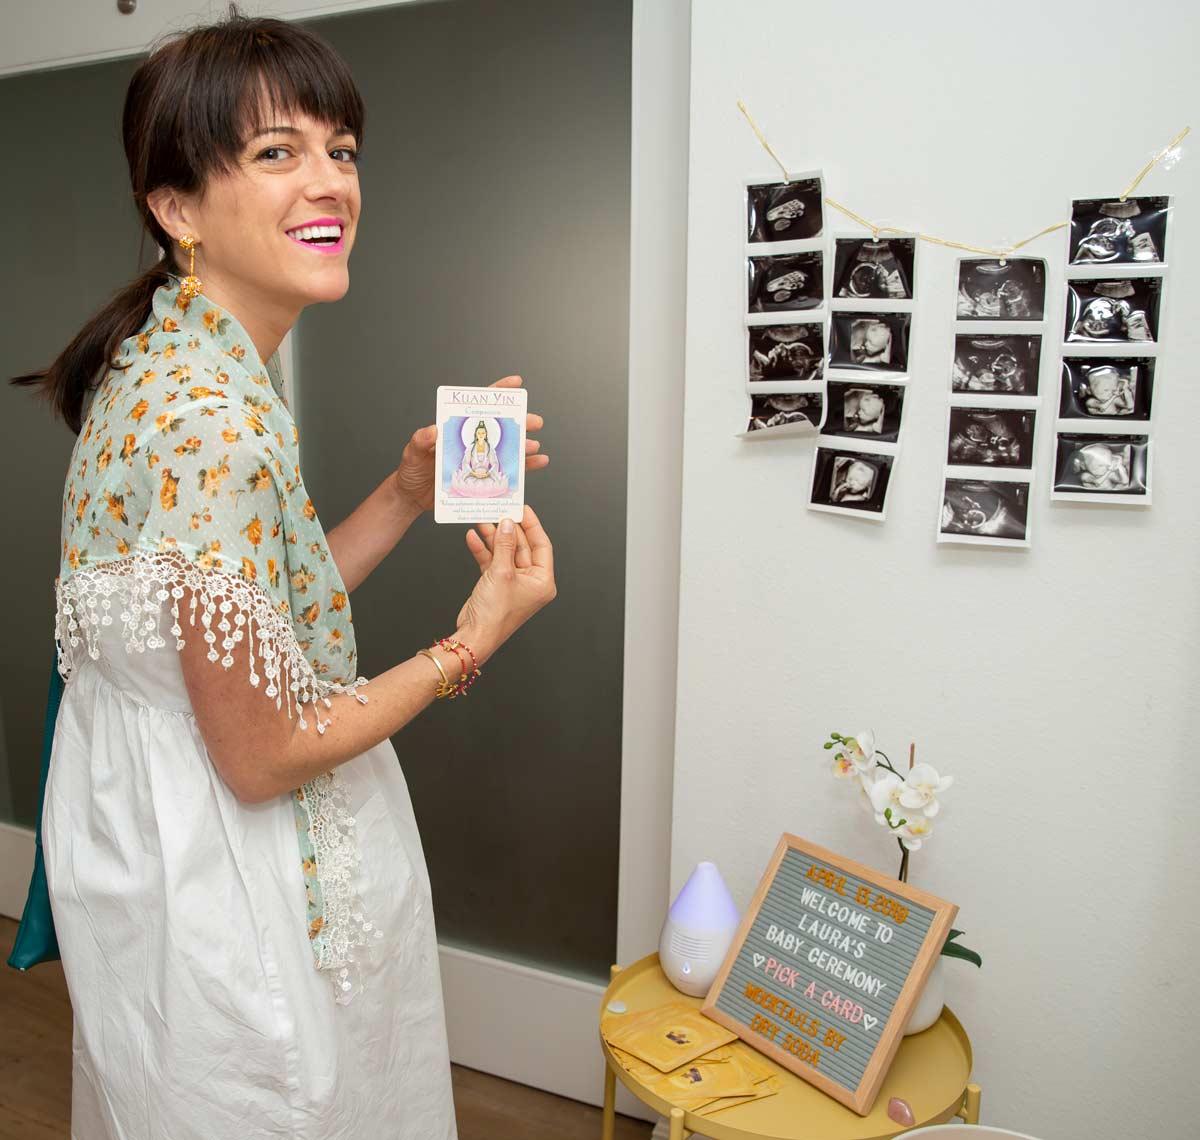 Guest, Karen, sharing the card selected